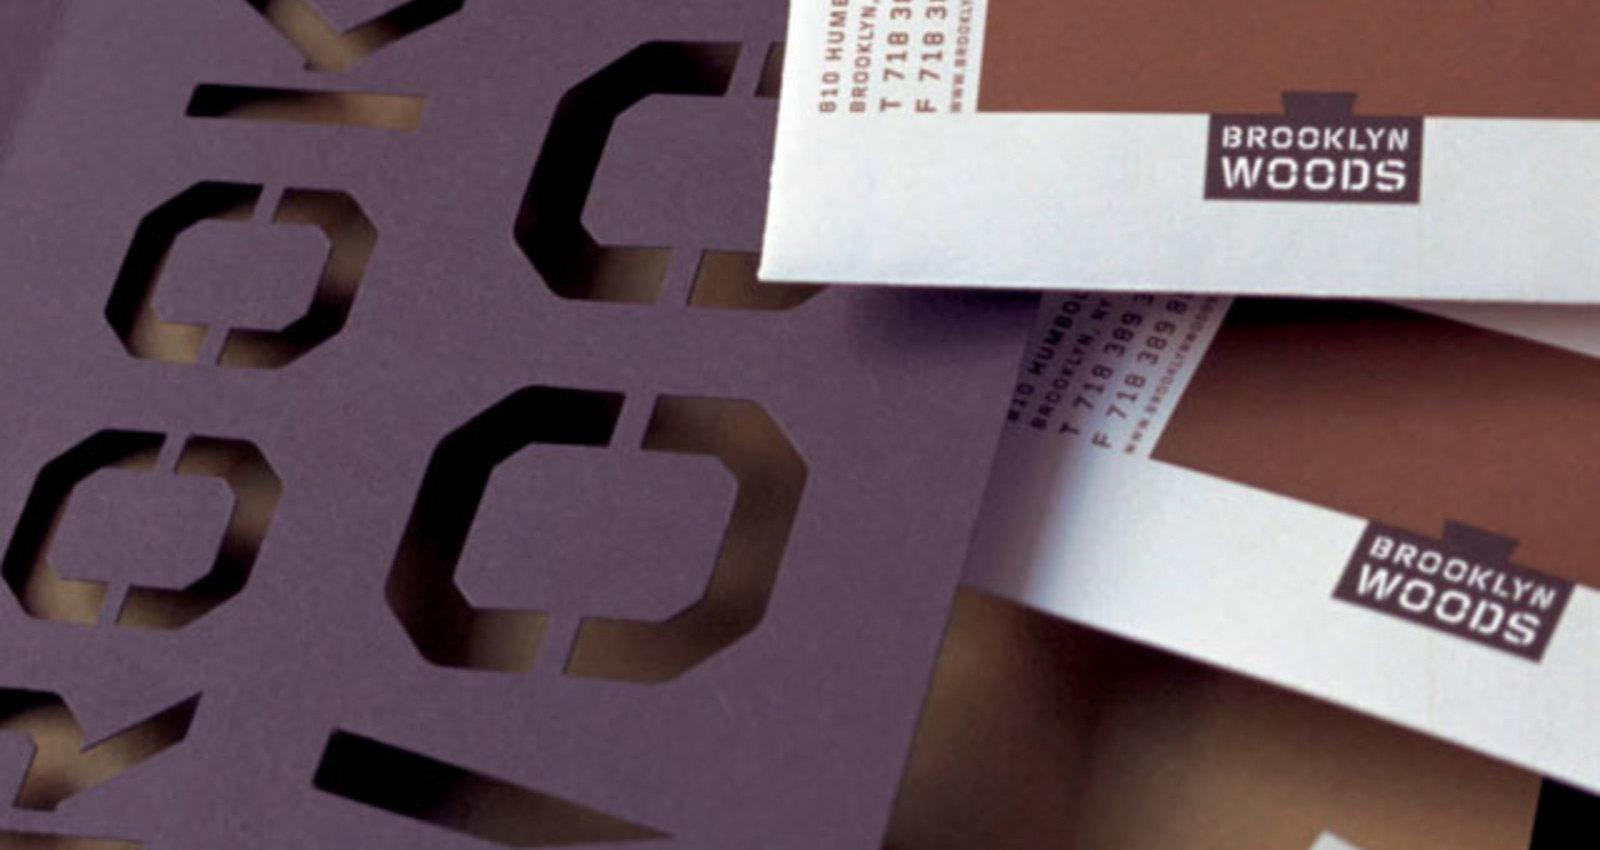 brooklyn woods corporate identity system